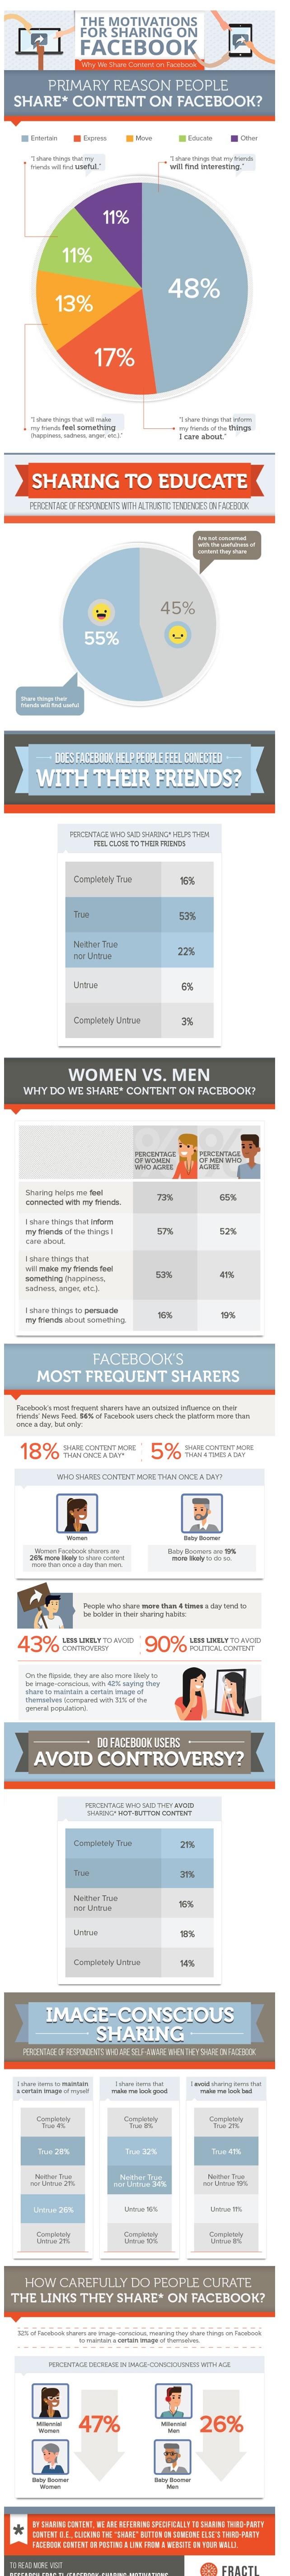 infograficos-sobre-compartilhamento-facebook